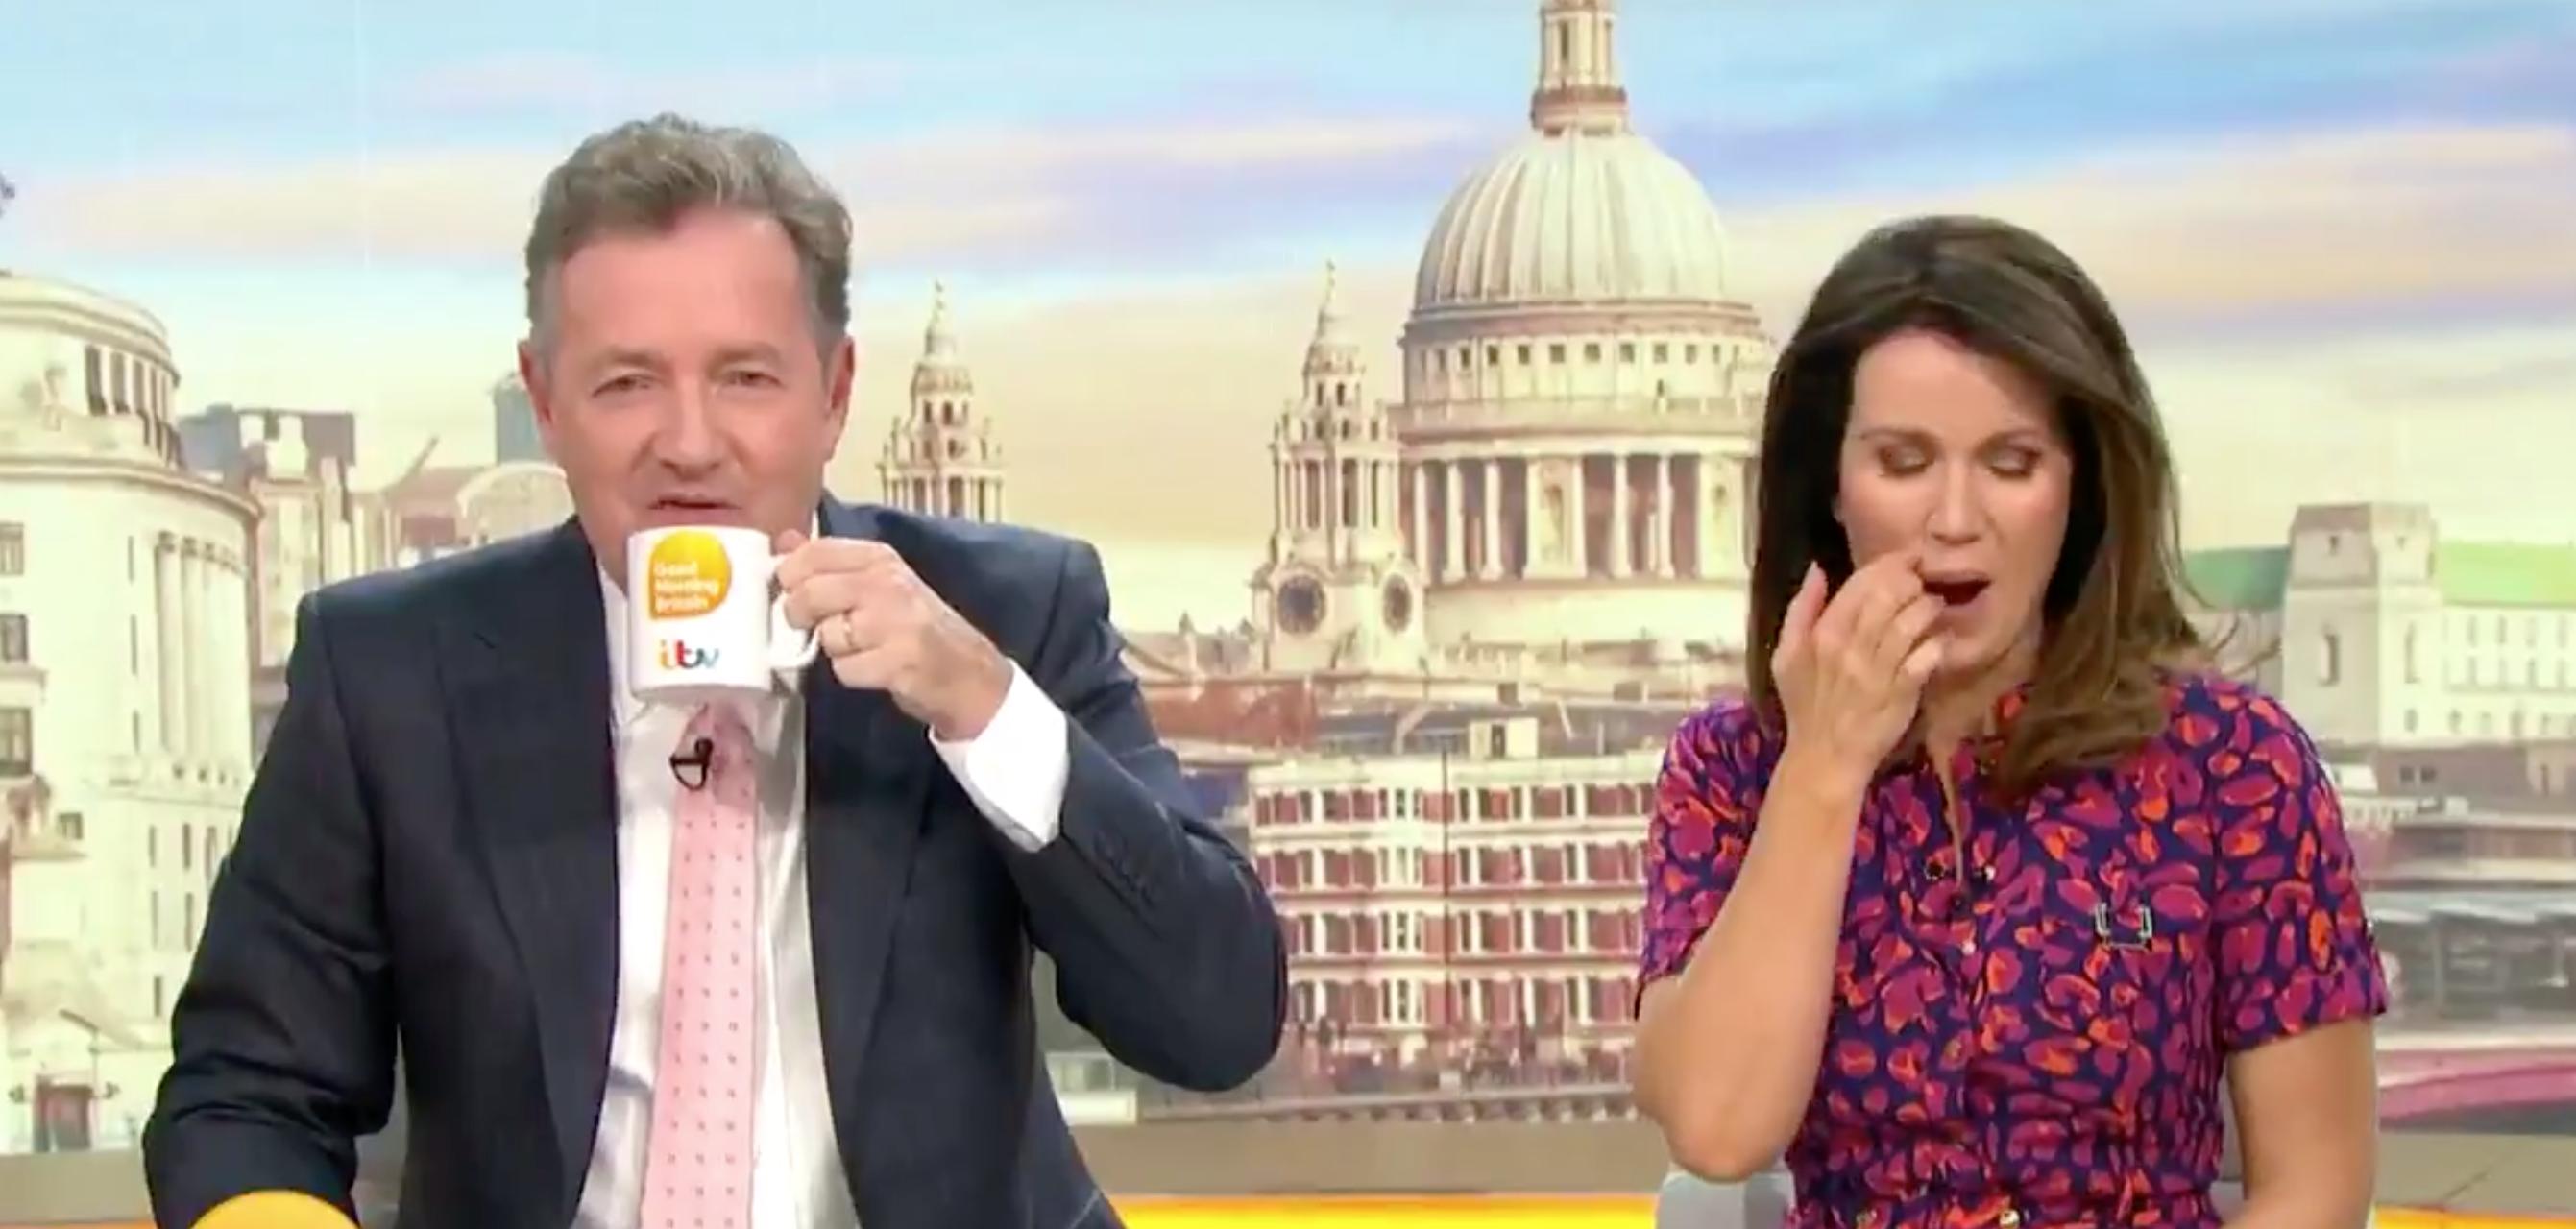 Viewers split as Piers Morgan returns to Good Morning Britain